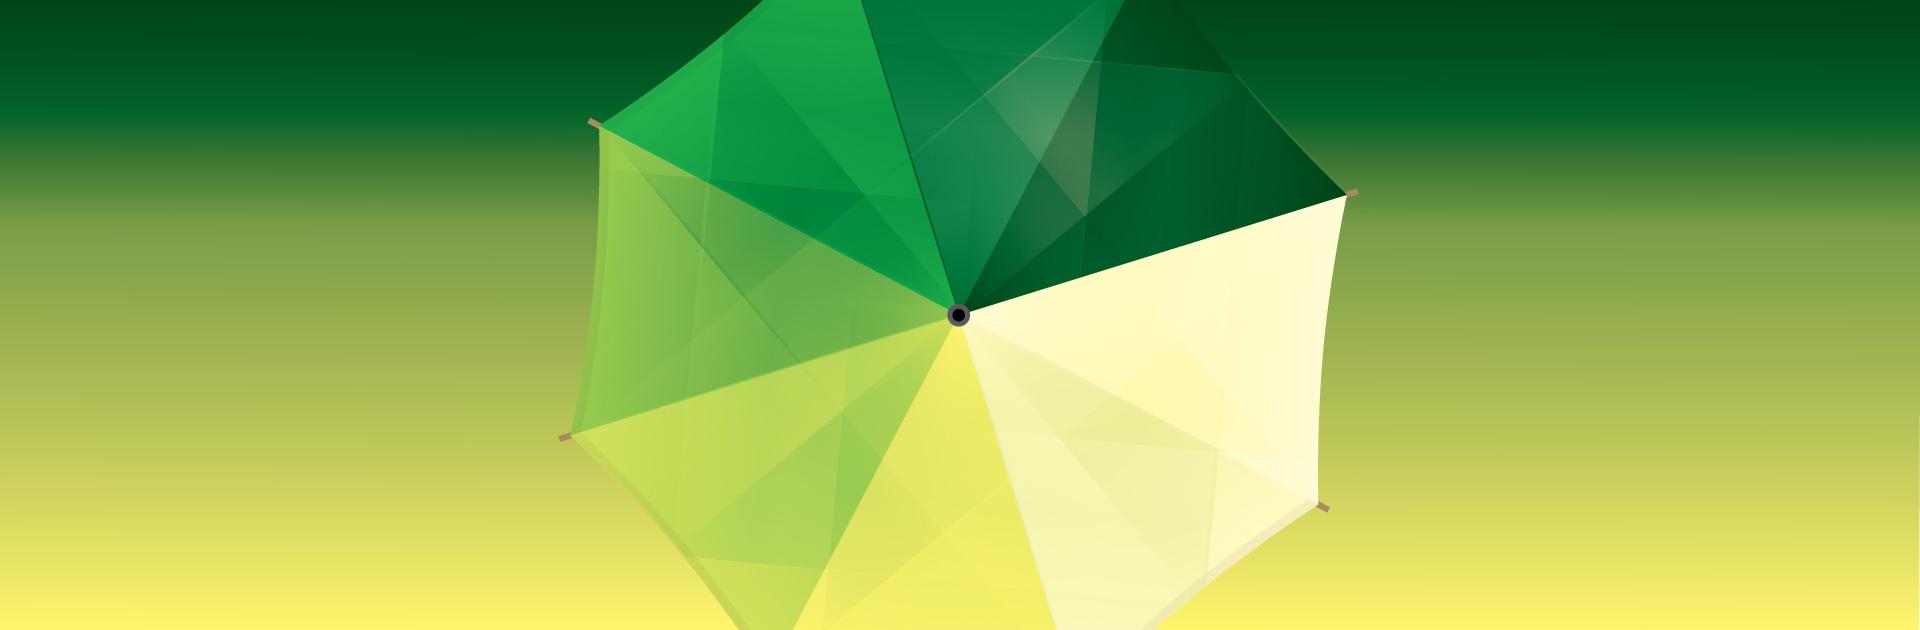 green-background3